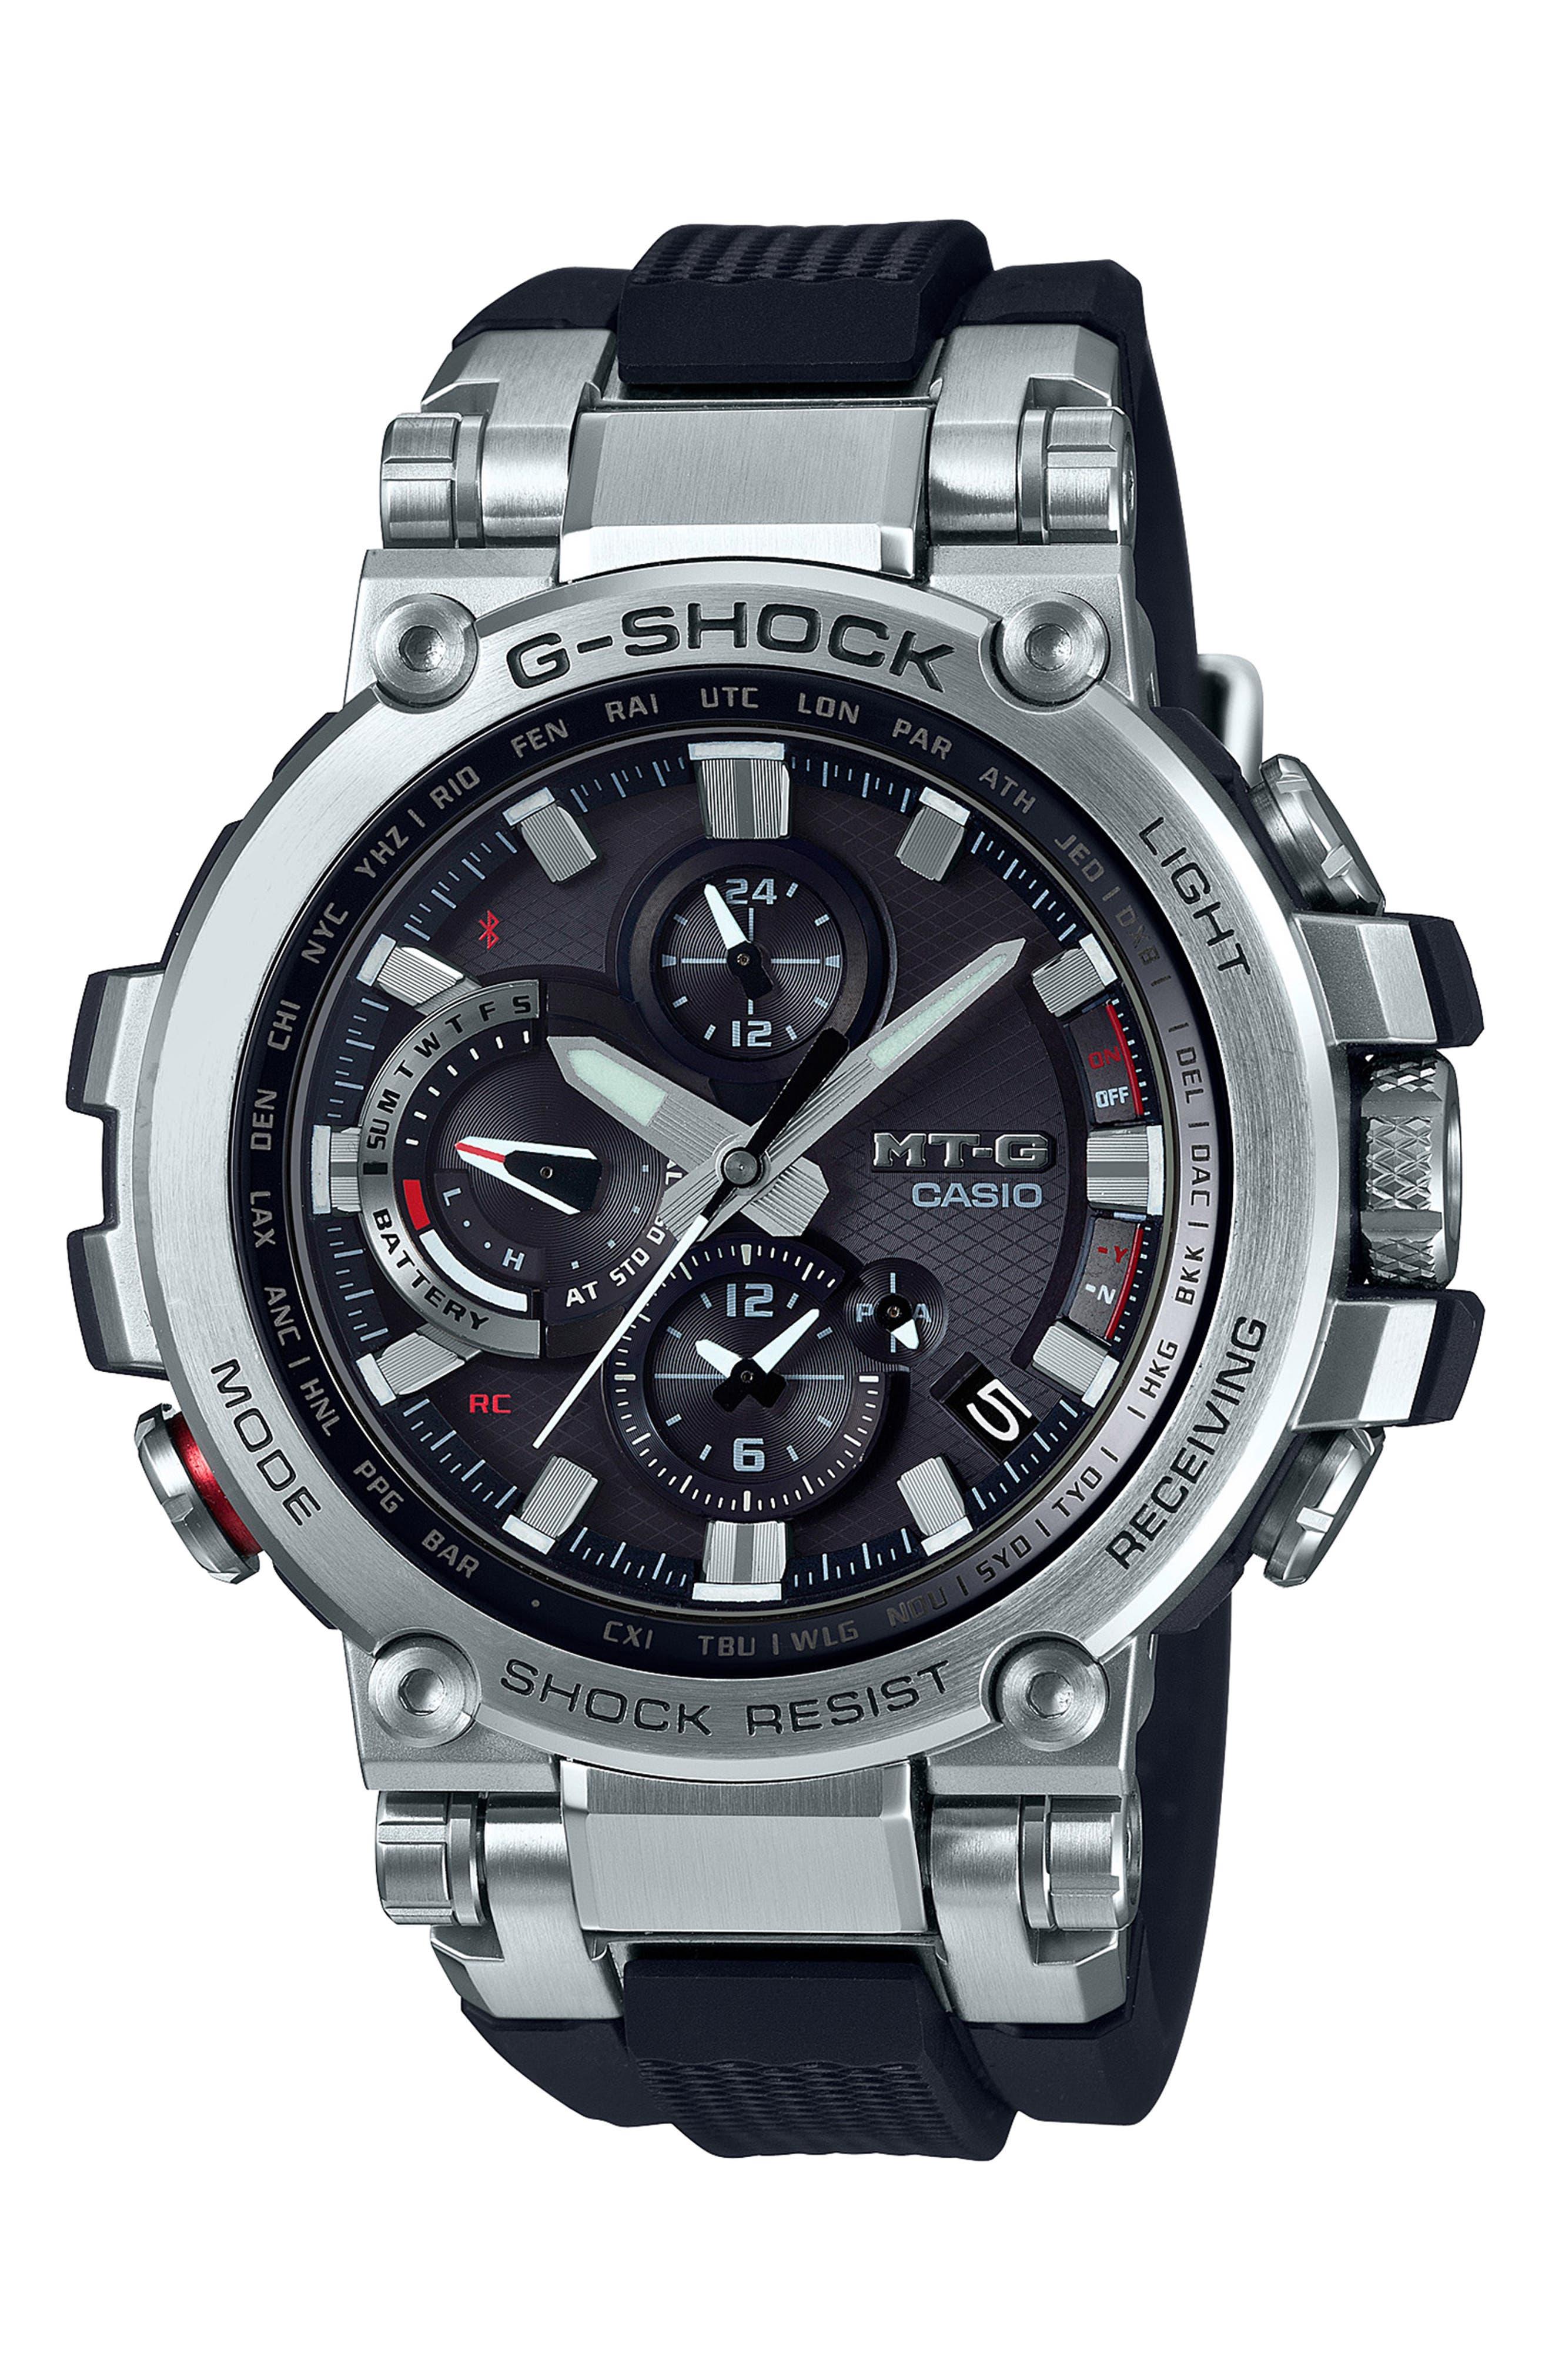 G-SHOCK BABY-G Analog Casio MT-G Watch, 52mm, Main, color, BLACK/ SILVER